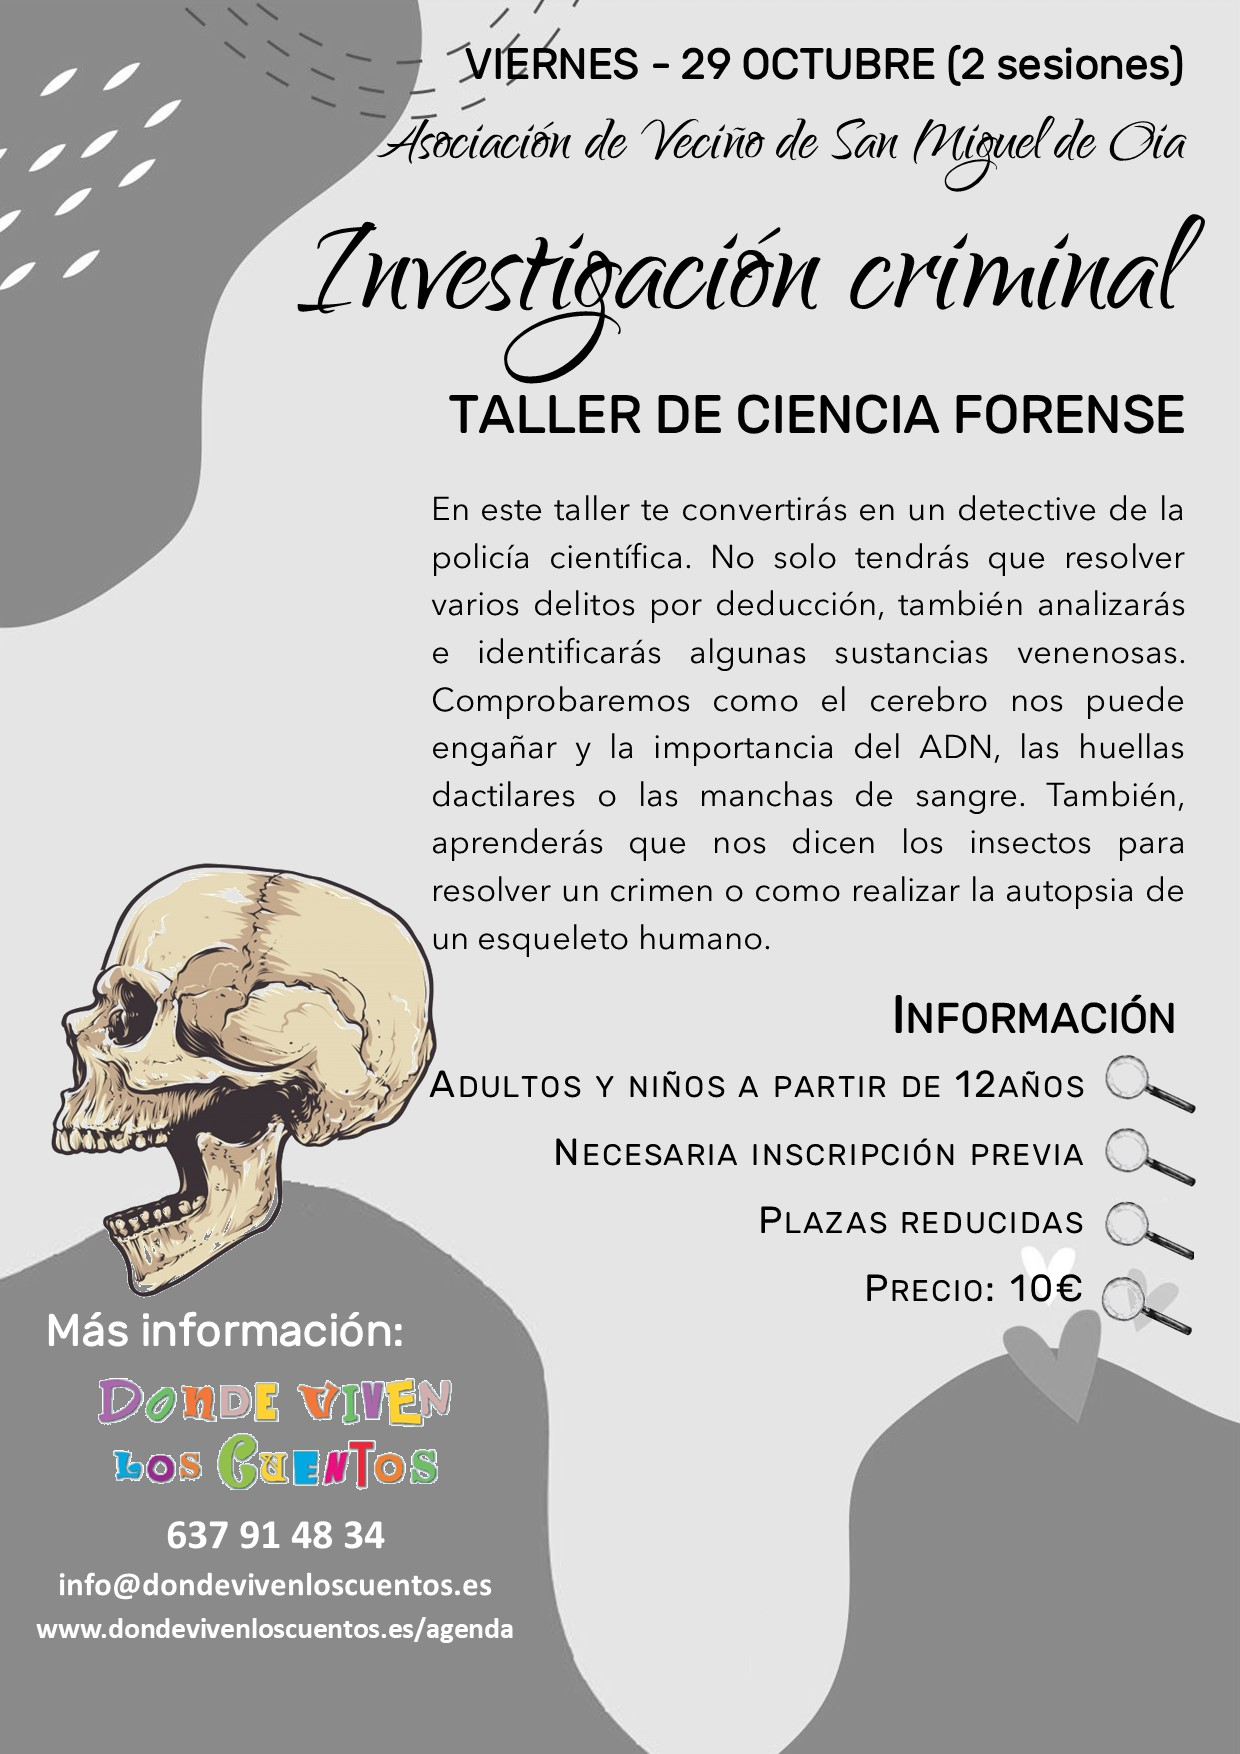 taller investigacion cientifica ciencia forense vigo